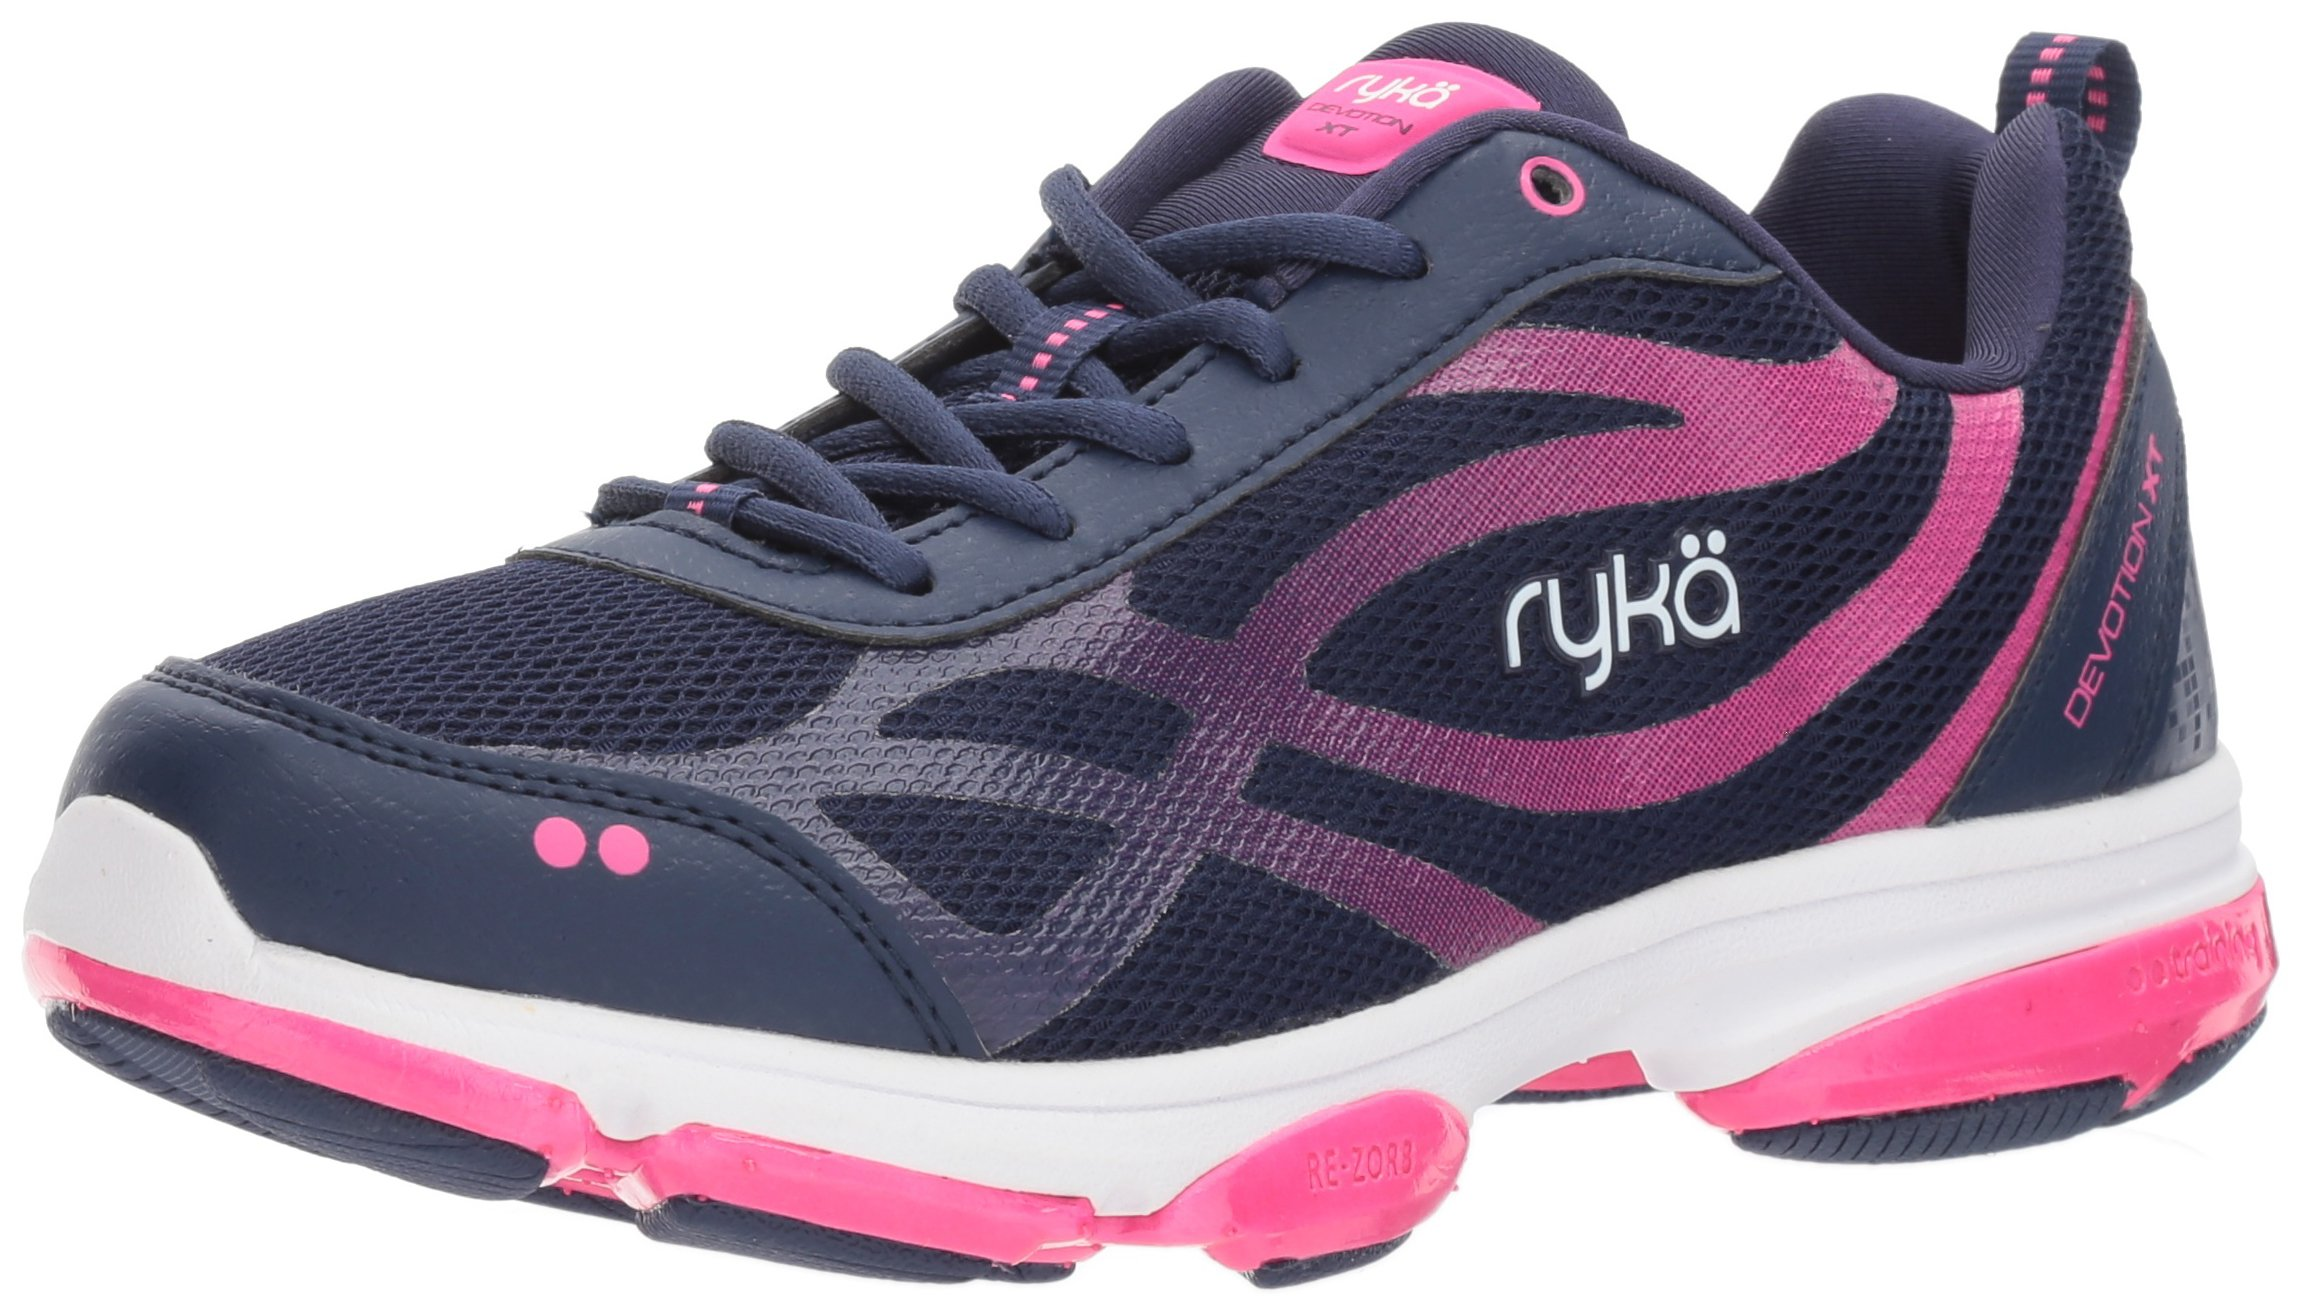 Ryka Women's Devotion XT Cross Trainer, Medieval Blue/Athena Pink/White, 10 M US